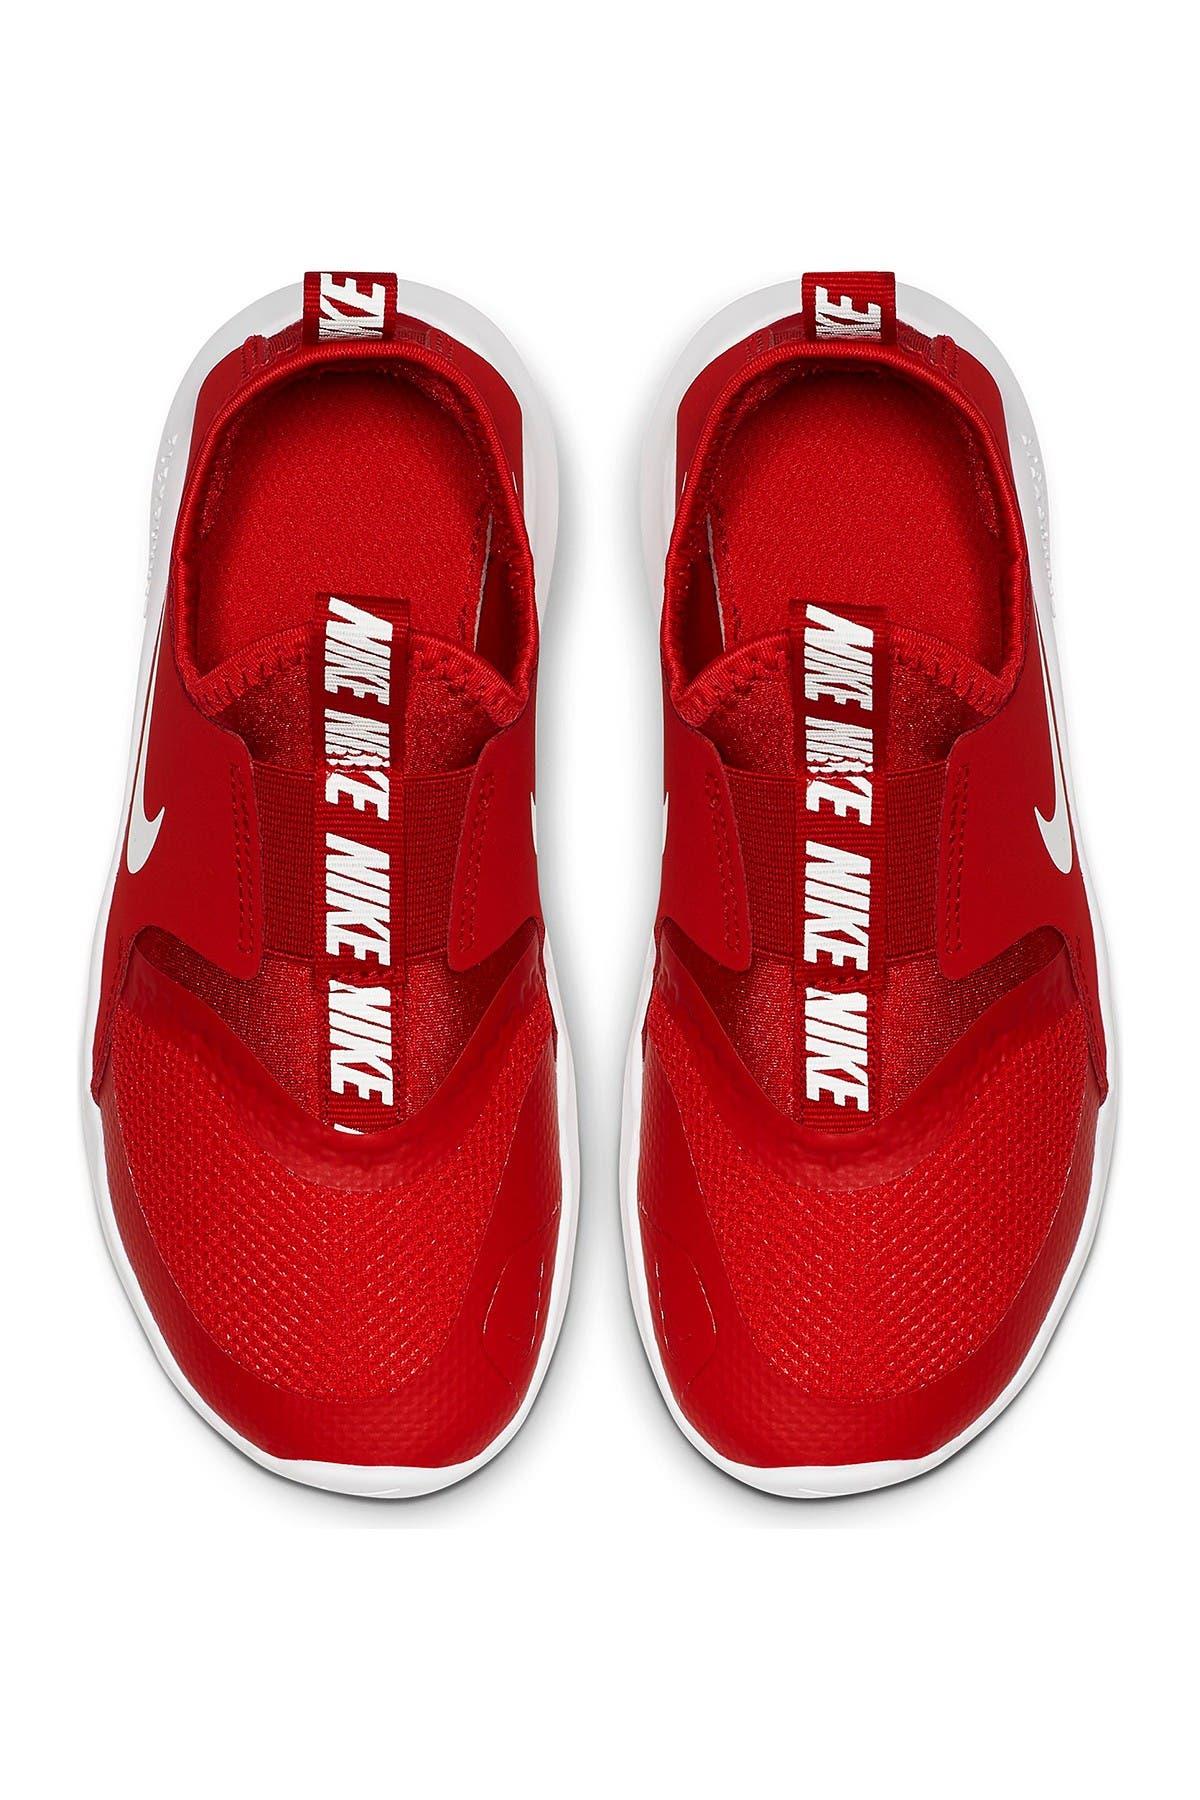 Nike | Future Flex PSV Sneaker | HauteLook